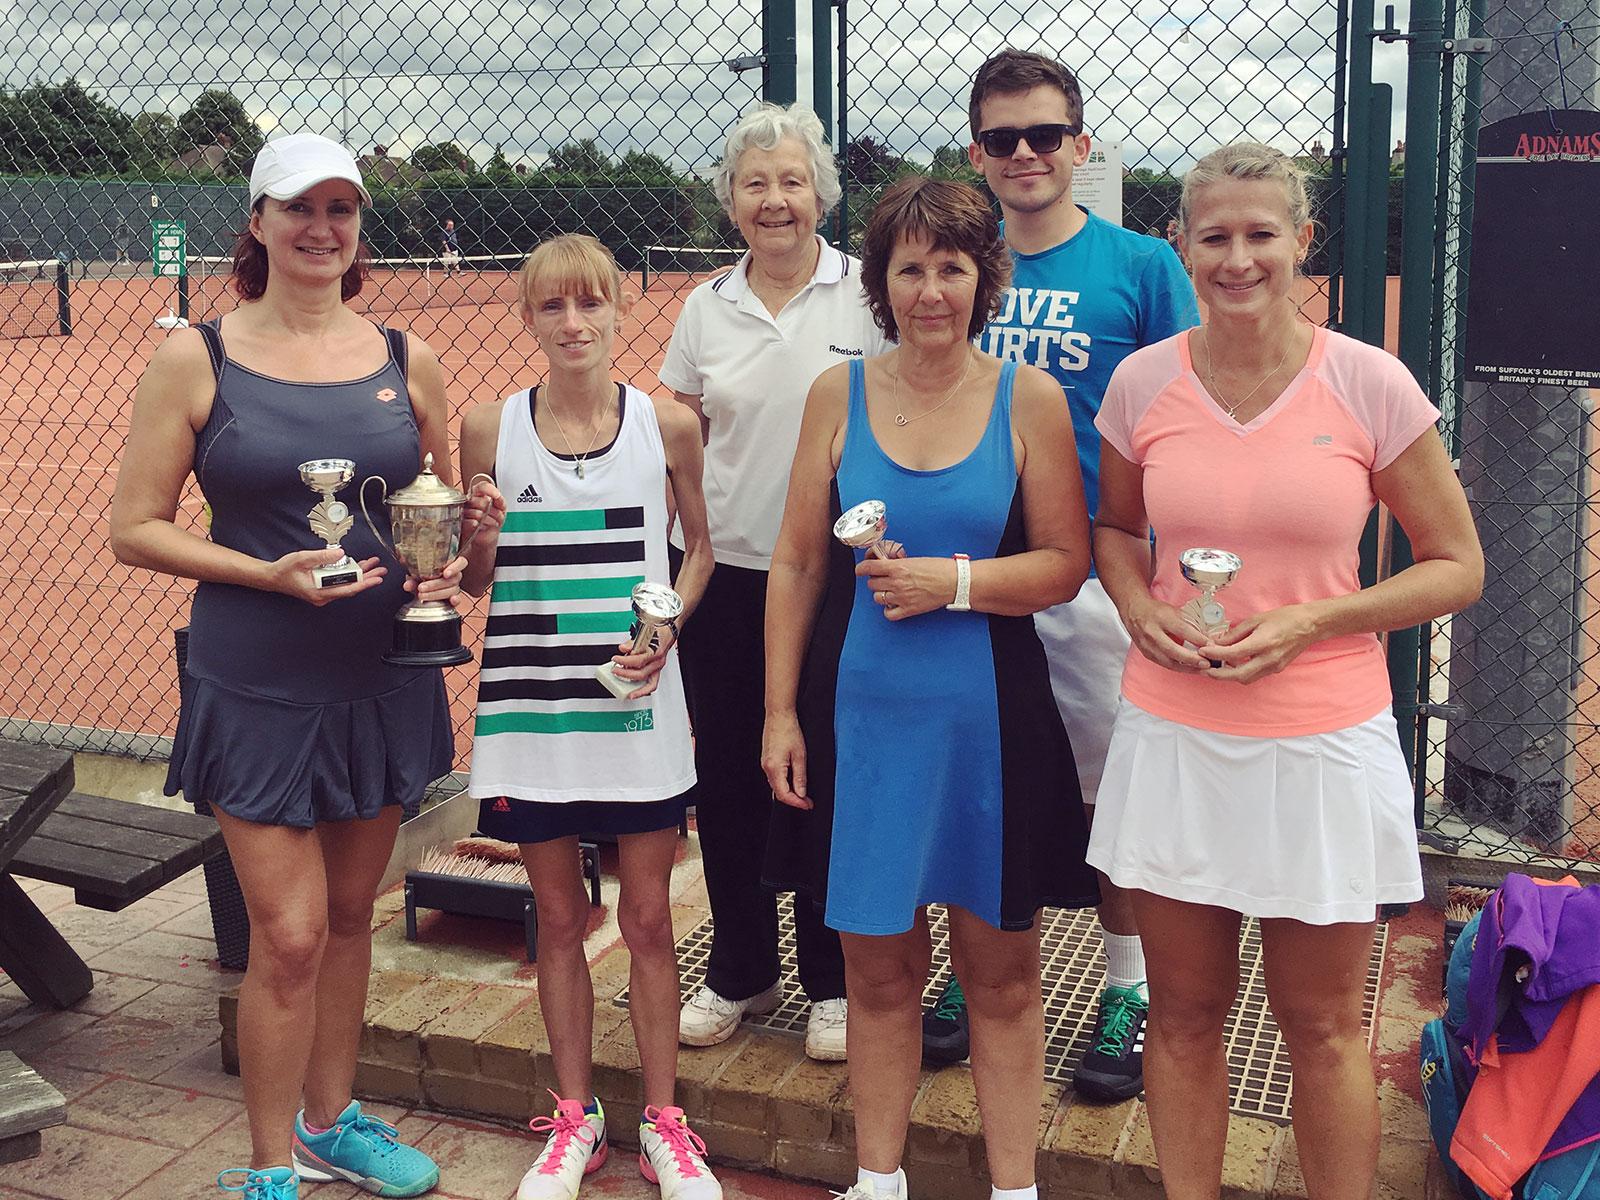 Ladies' Open Doubles Final 2017